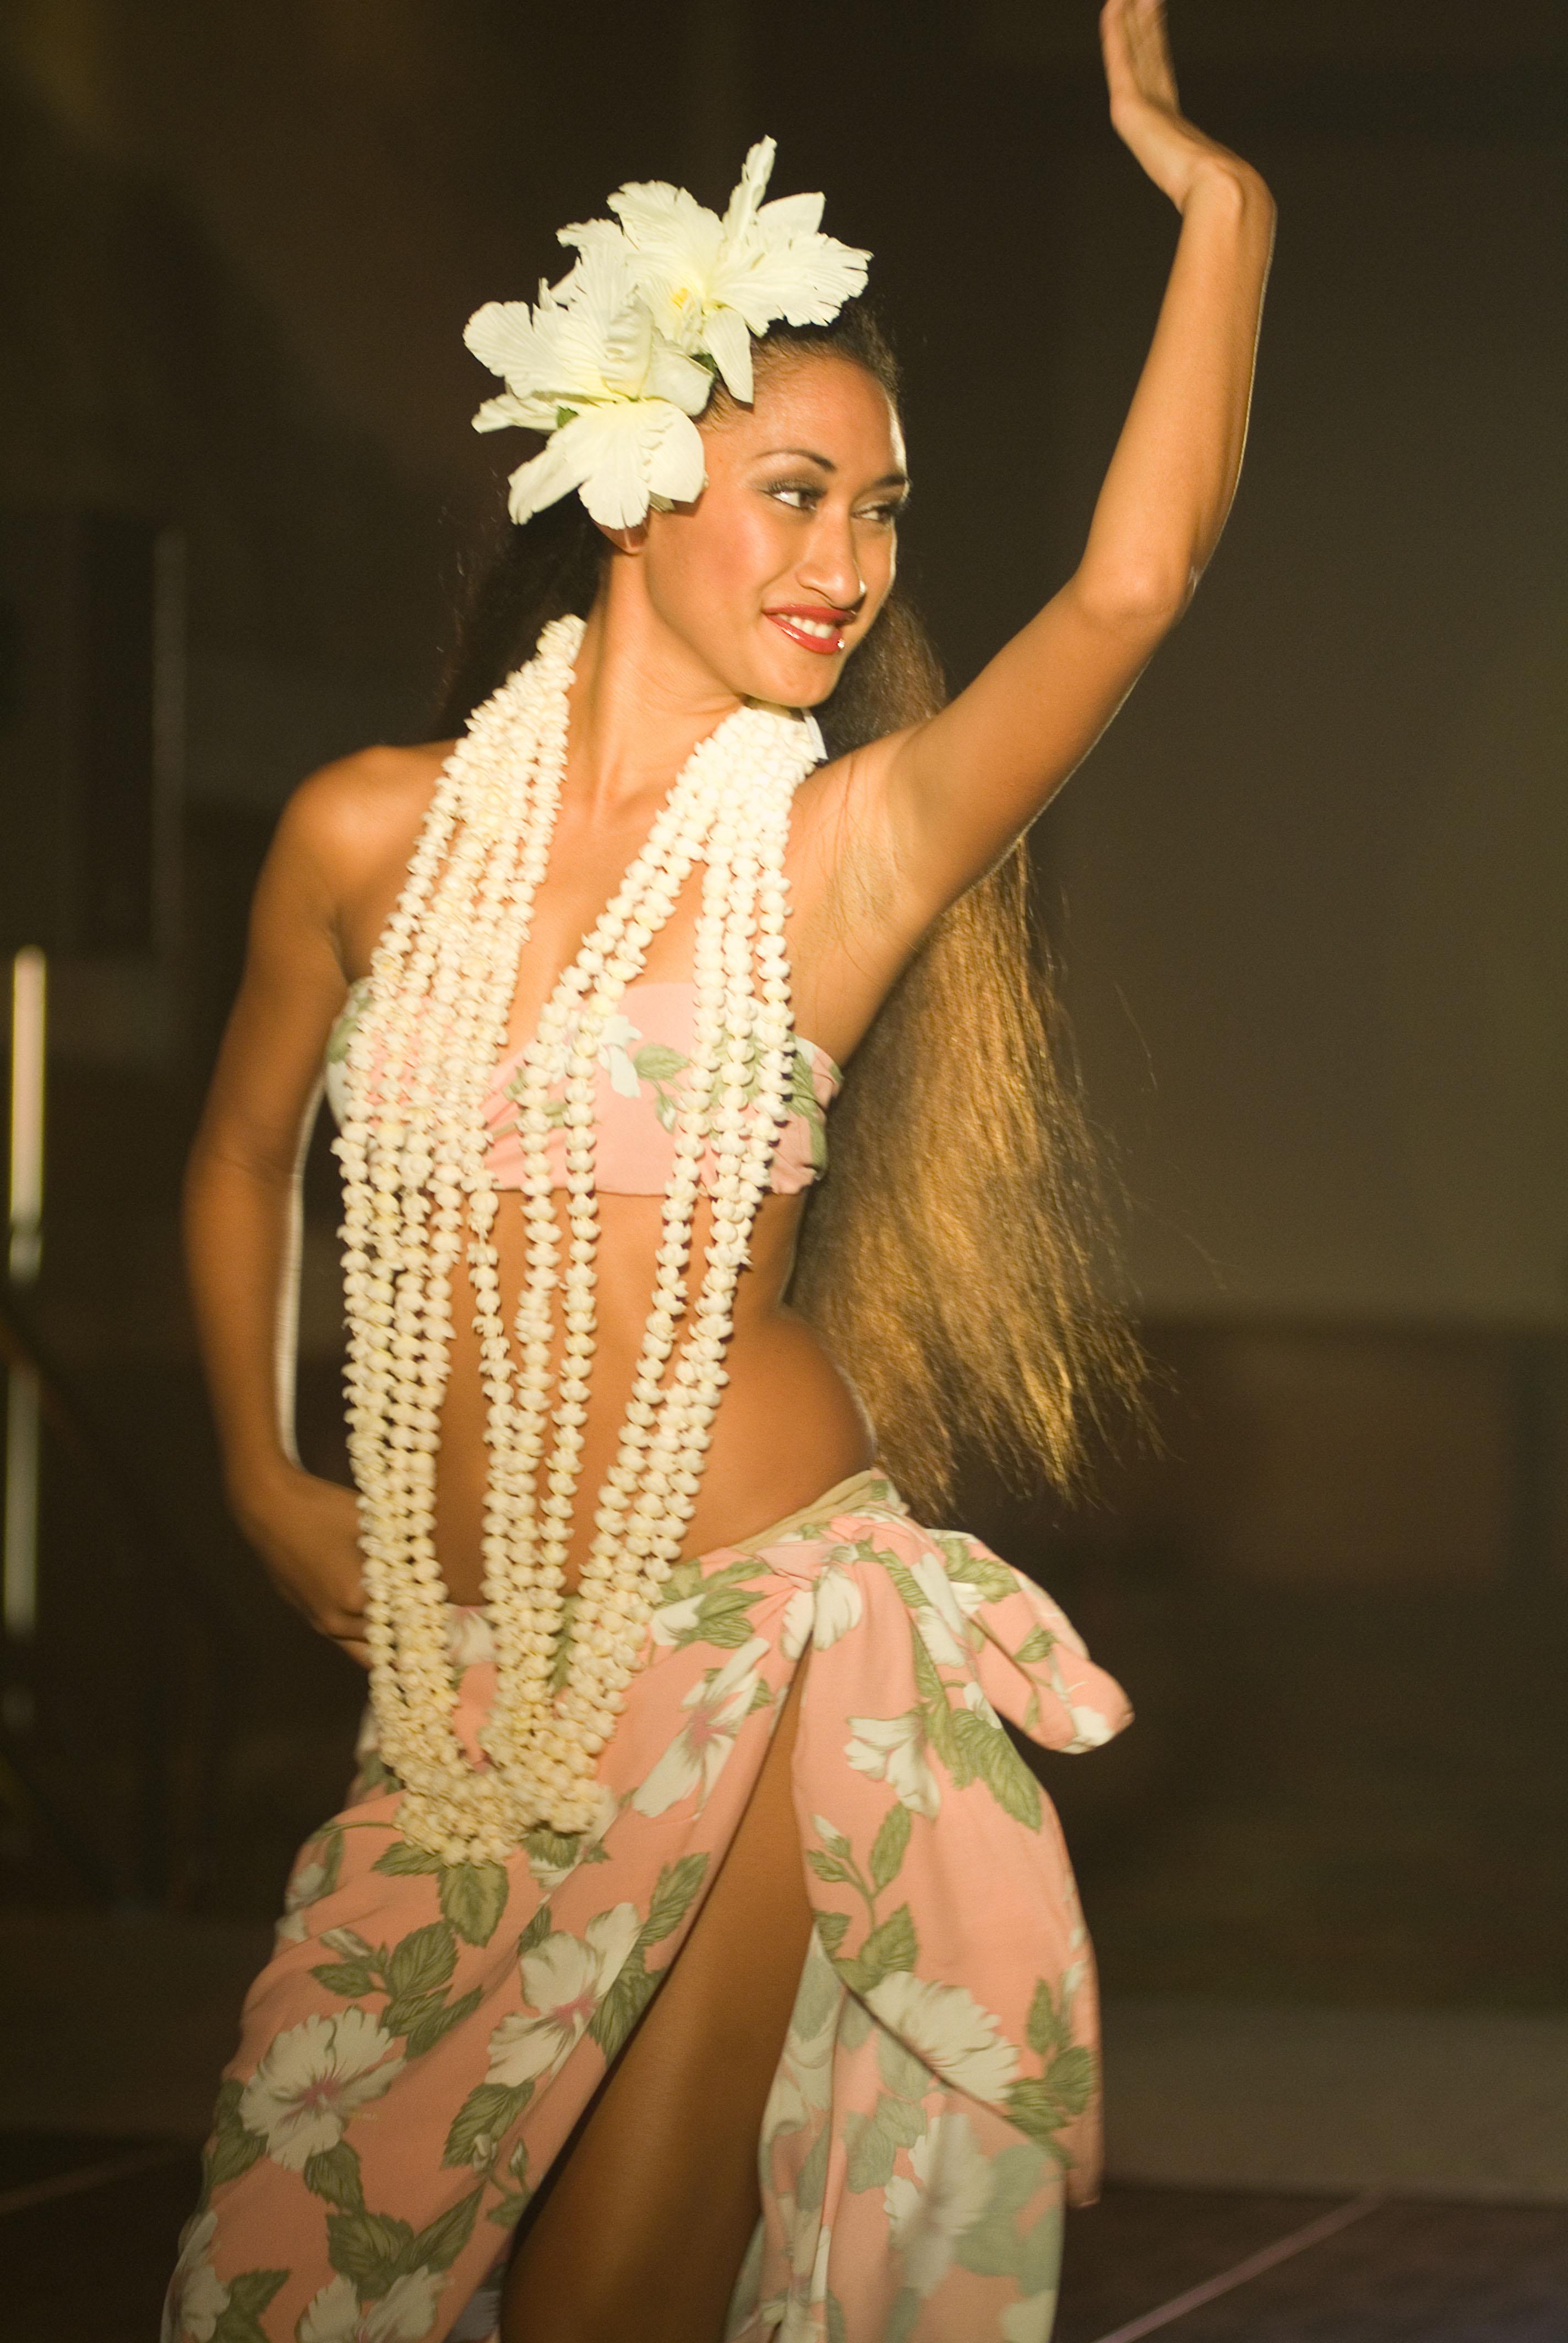 Kauai Festivals For 2010 Traveltomaui S Blog